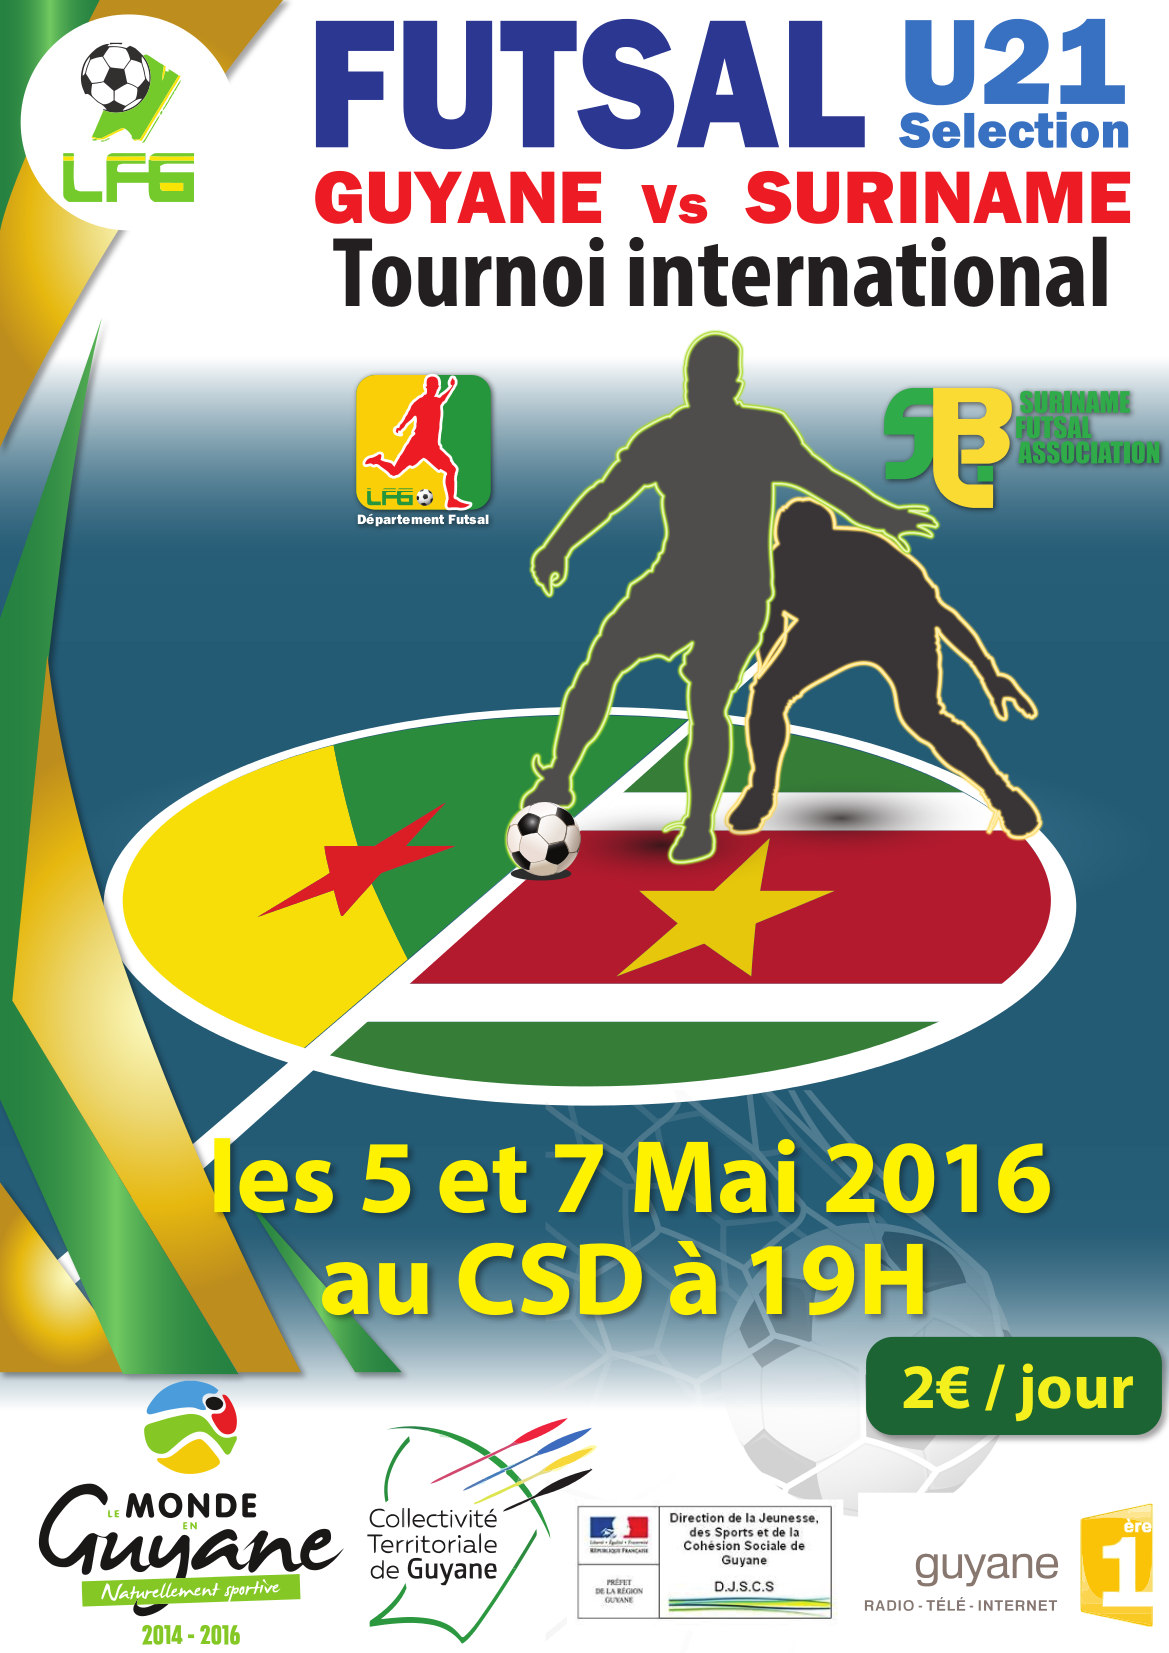 FUTSAL U21 GUYANE SURINAME (1)